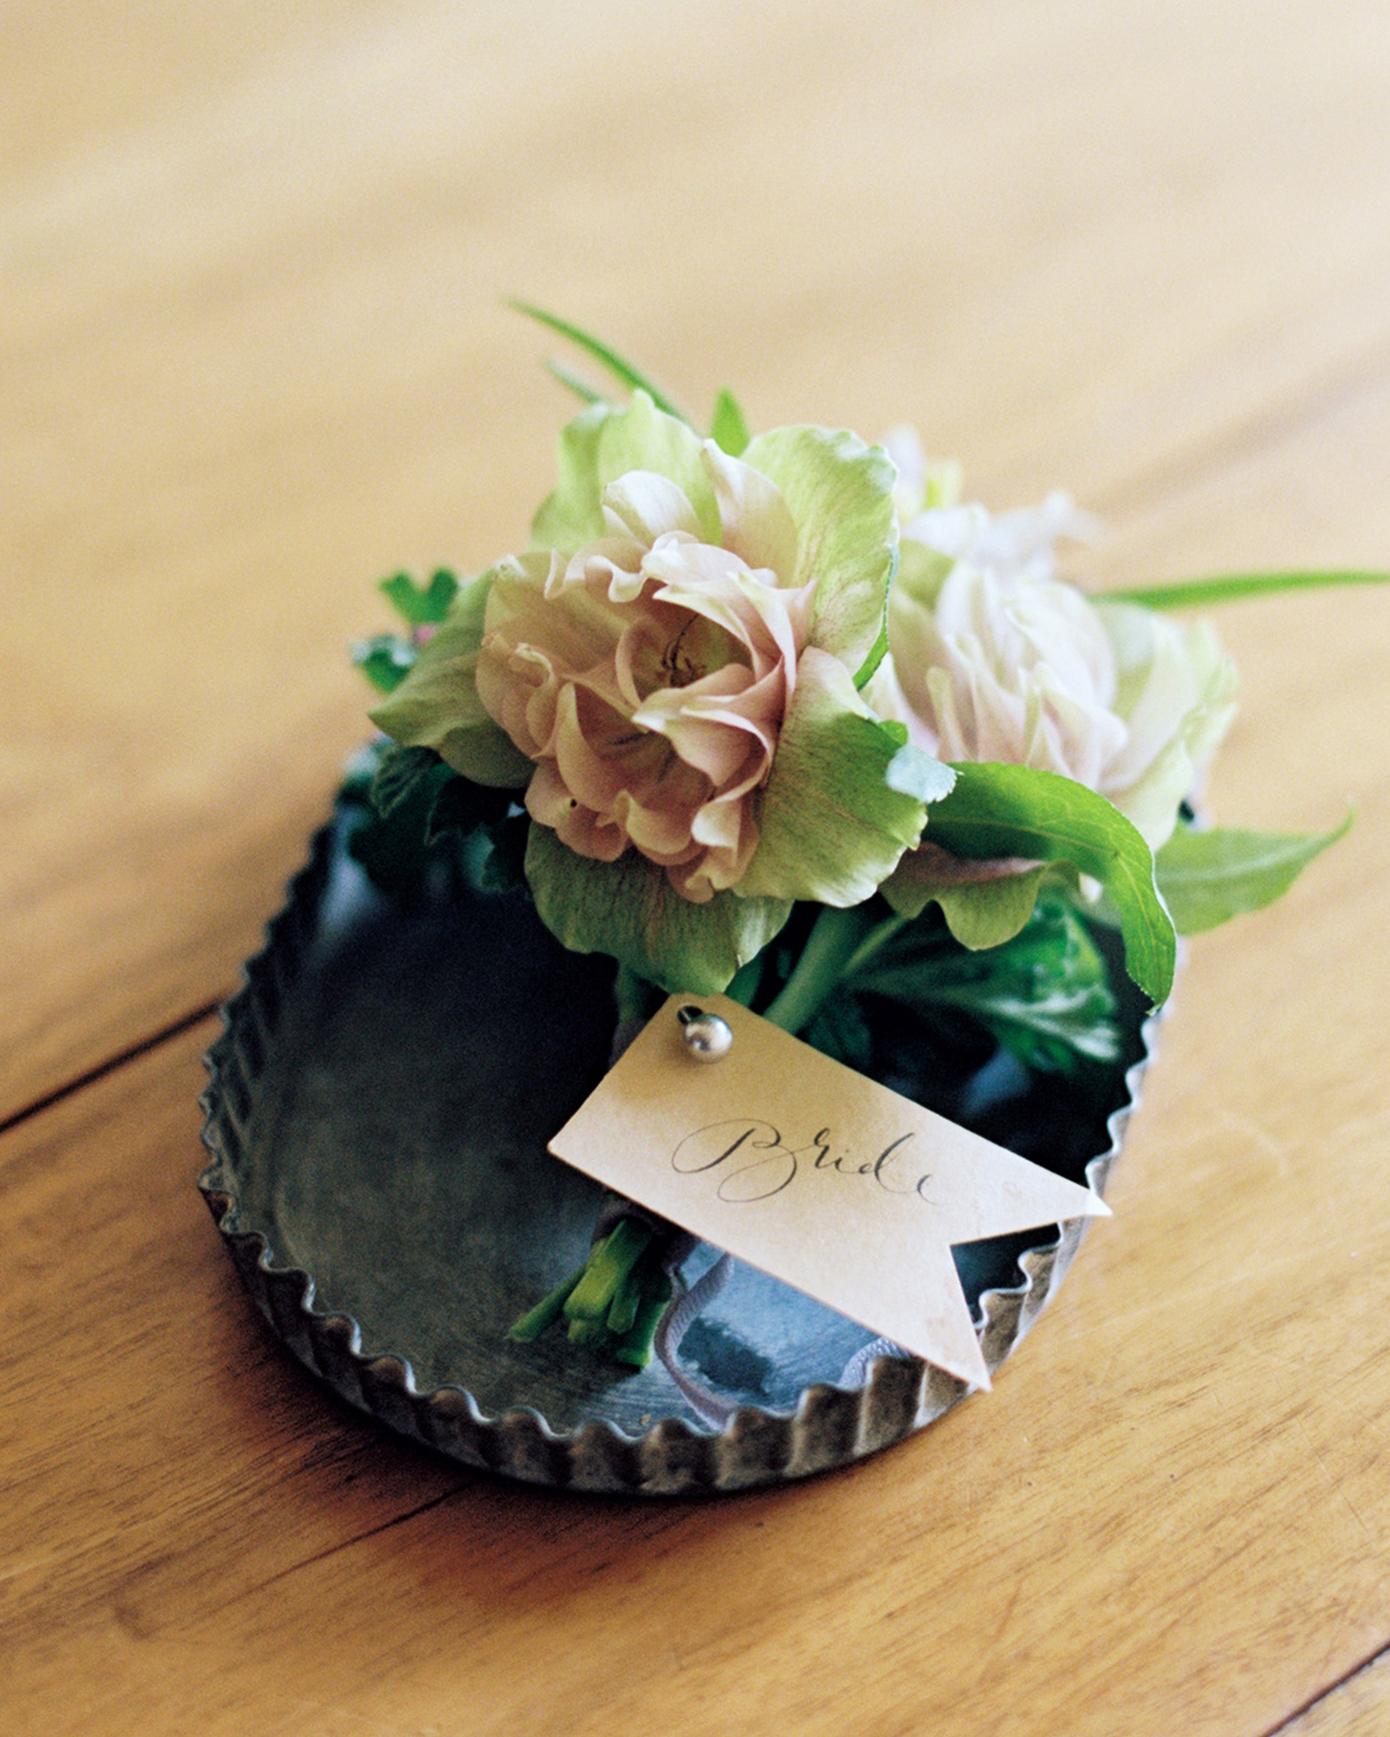 sydney-christina-wedding-corsage-013-s111743-0115.jpg